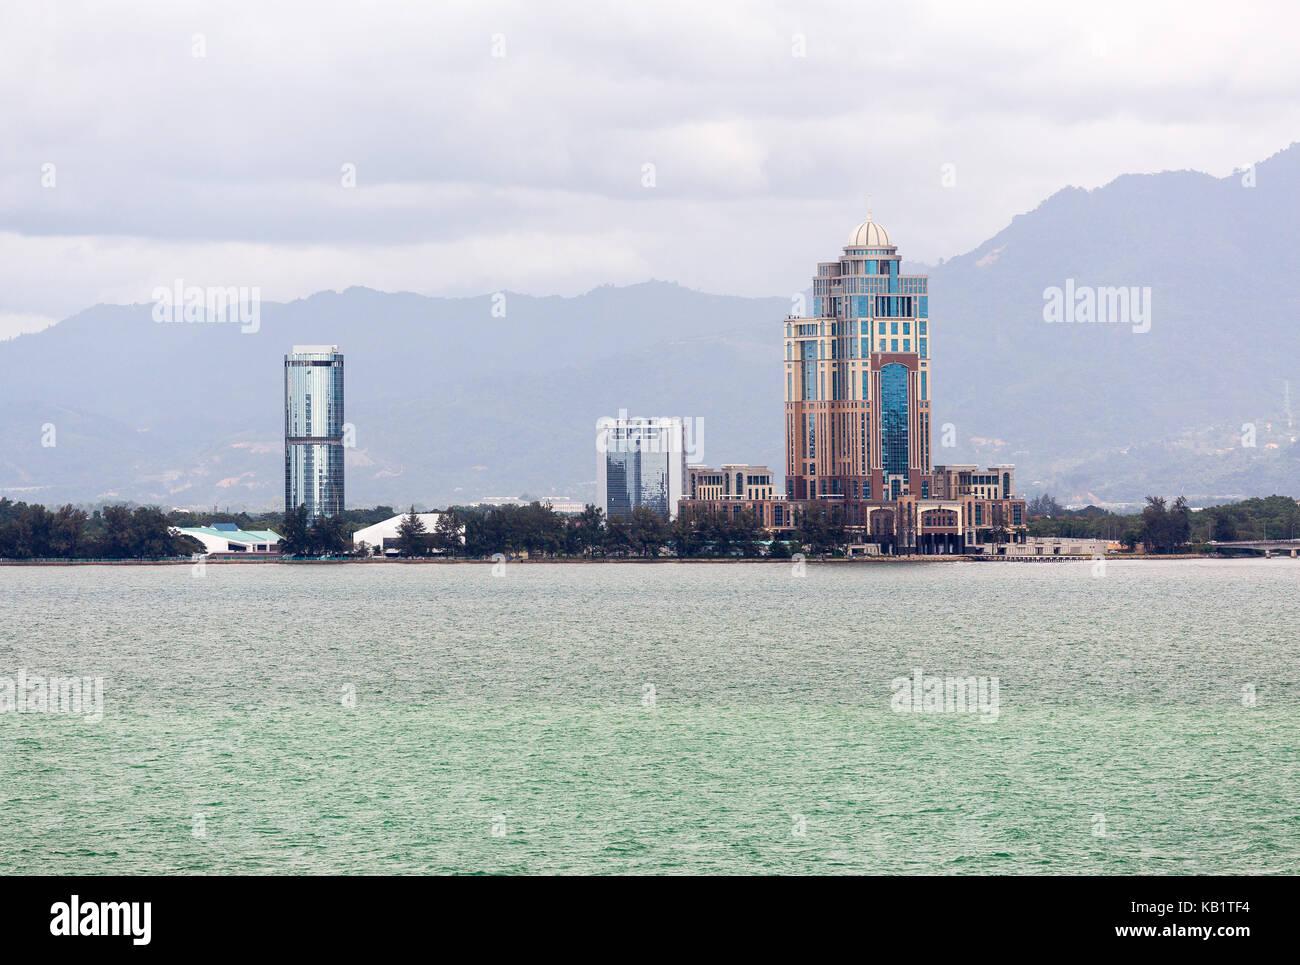 Just off yje coastline of Kota Kinabalu in Malaysia - Stock Image